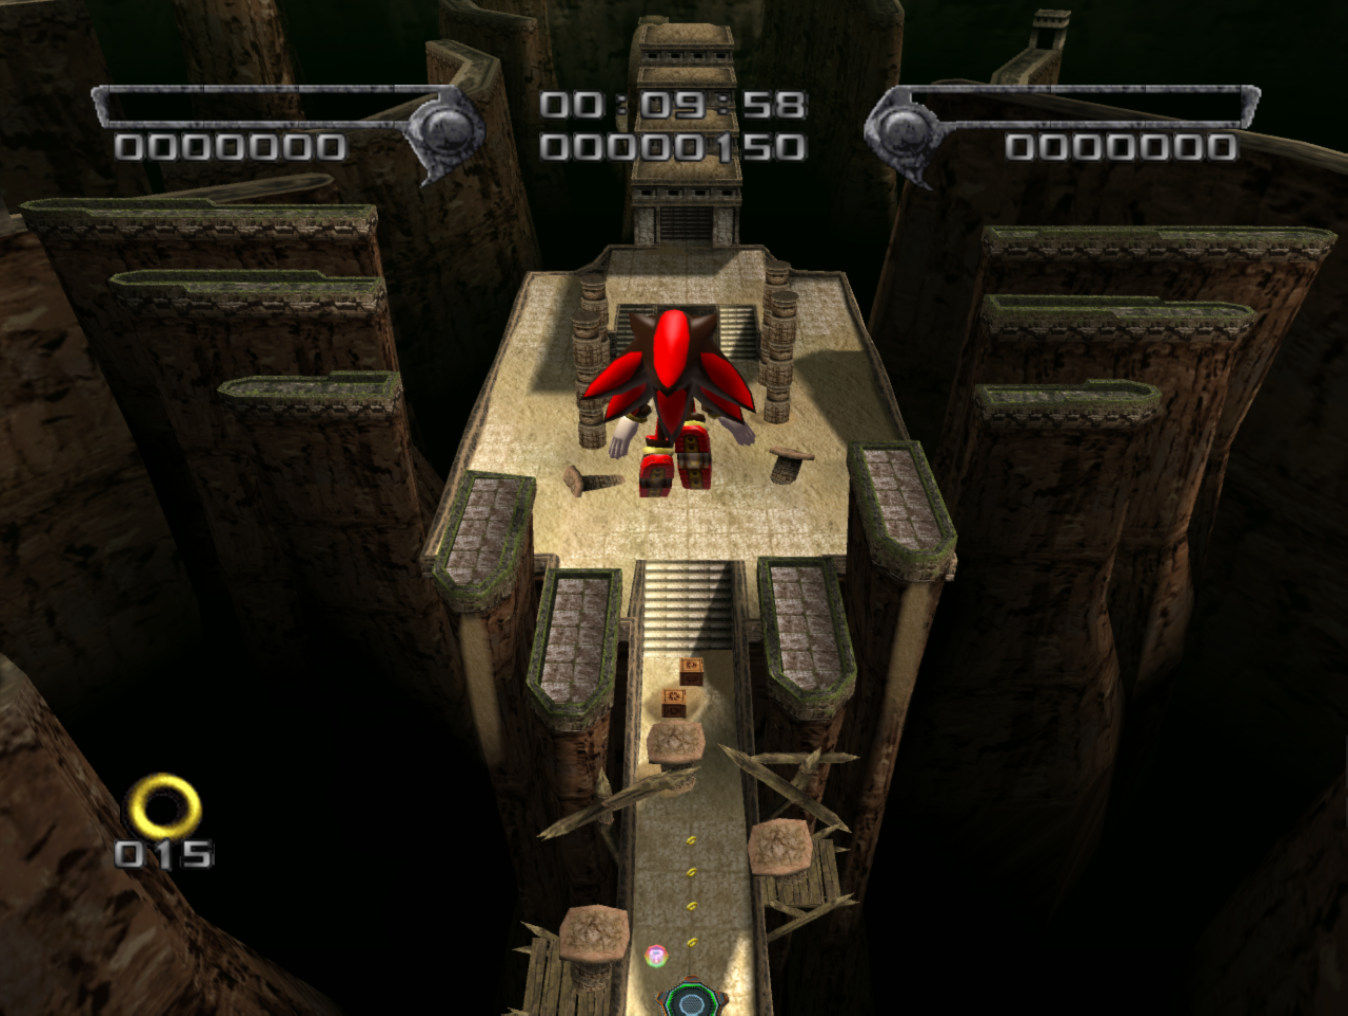 File:Glyphic Canyon Screenshot 2.png